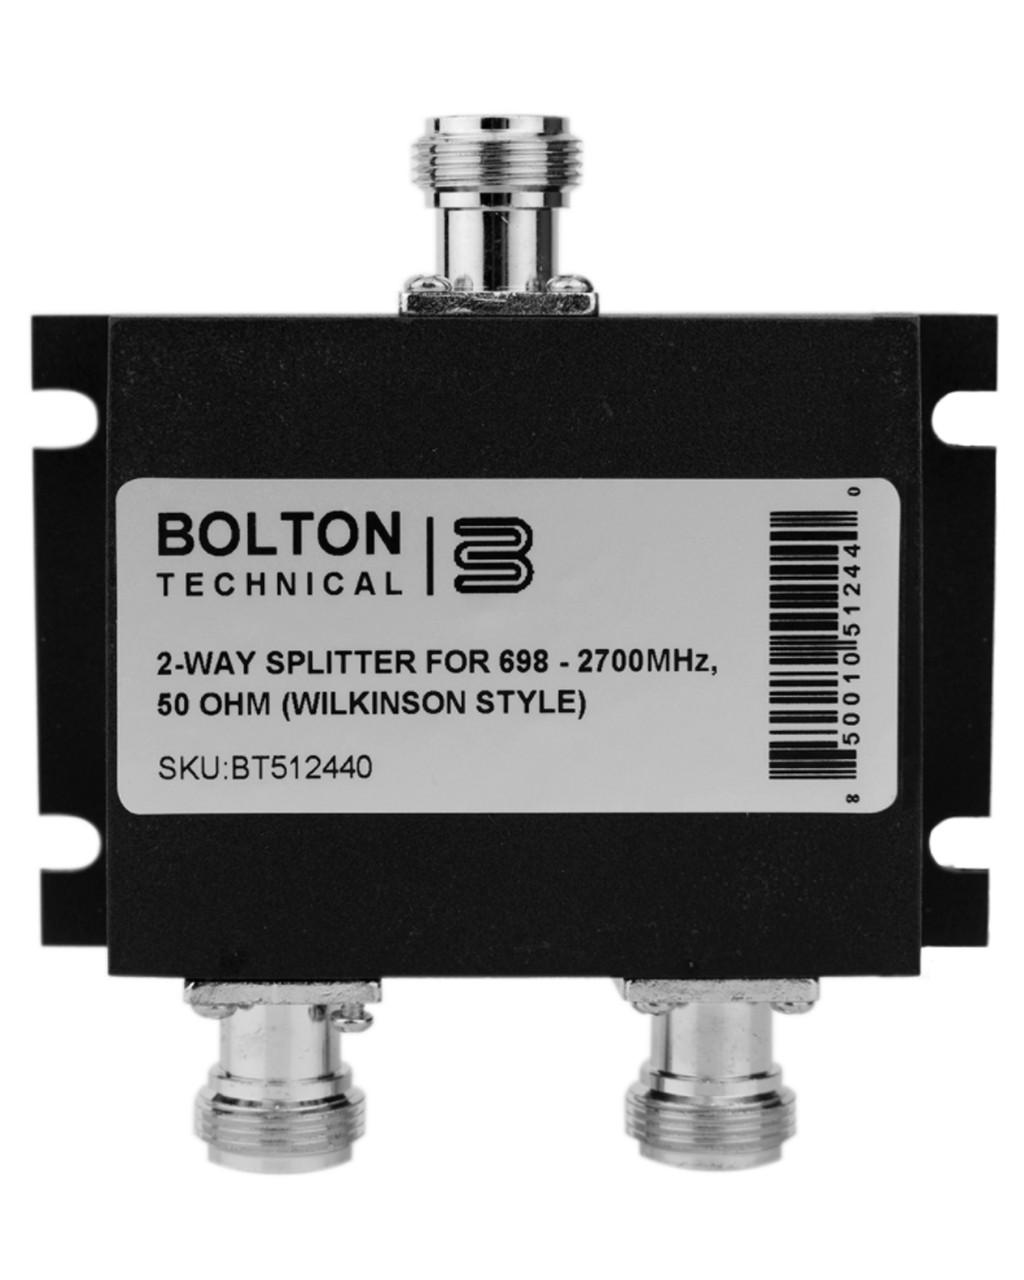 2-Way Splitter - for 689-2700 MHz Wilkinson Style 50 Ohm